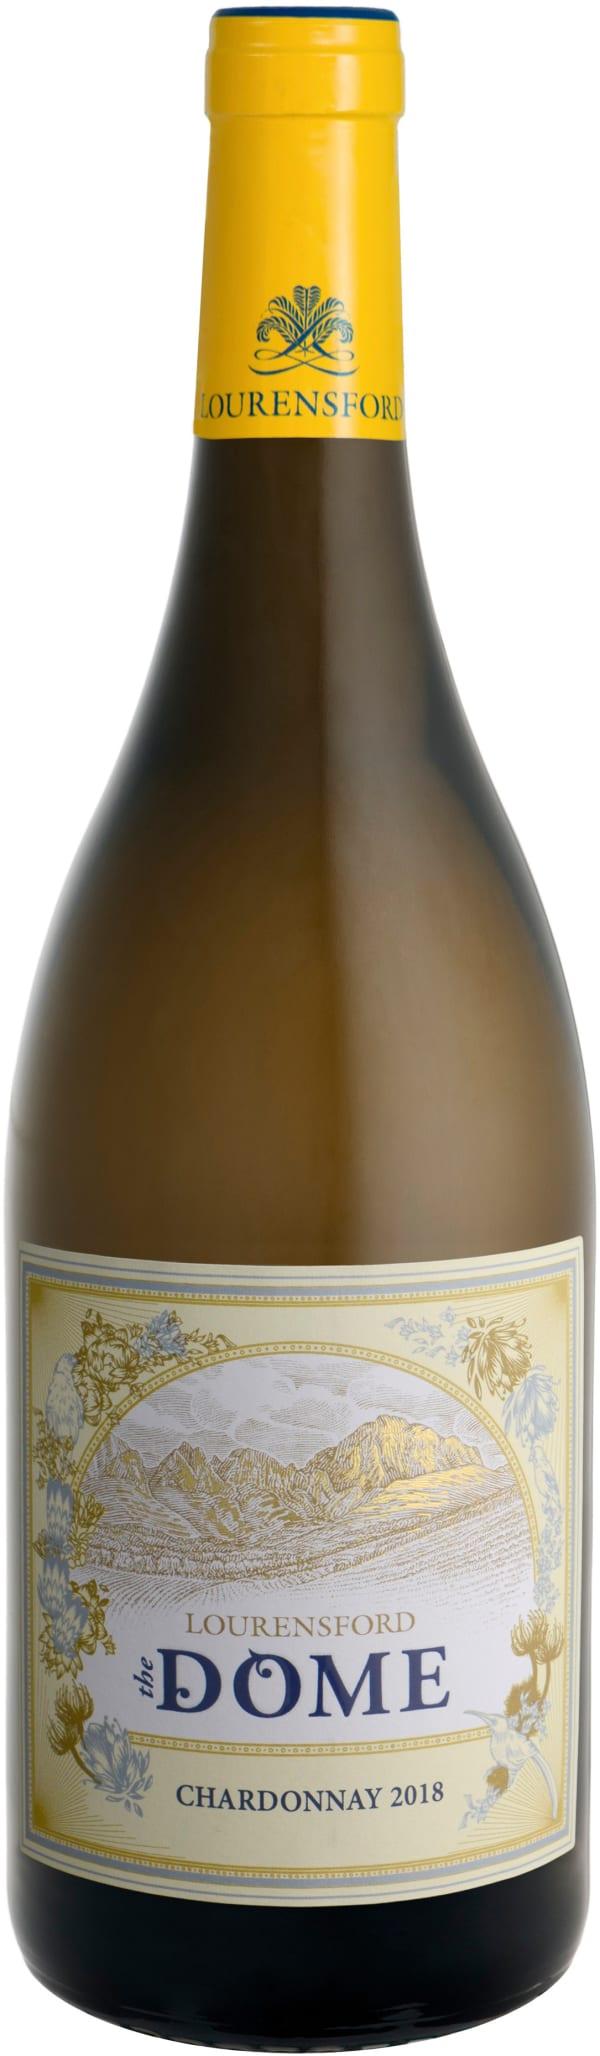 Lourensford The Dome Chardonnay 2018